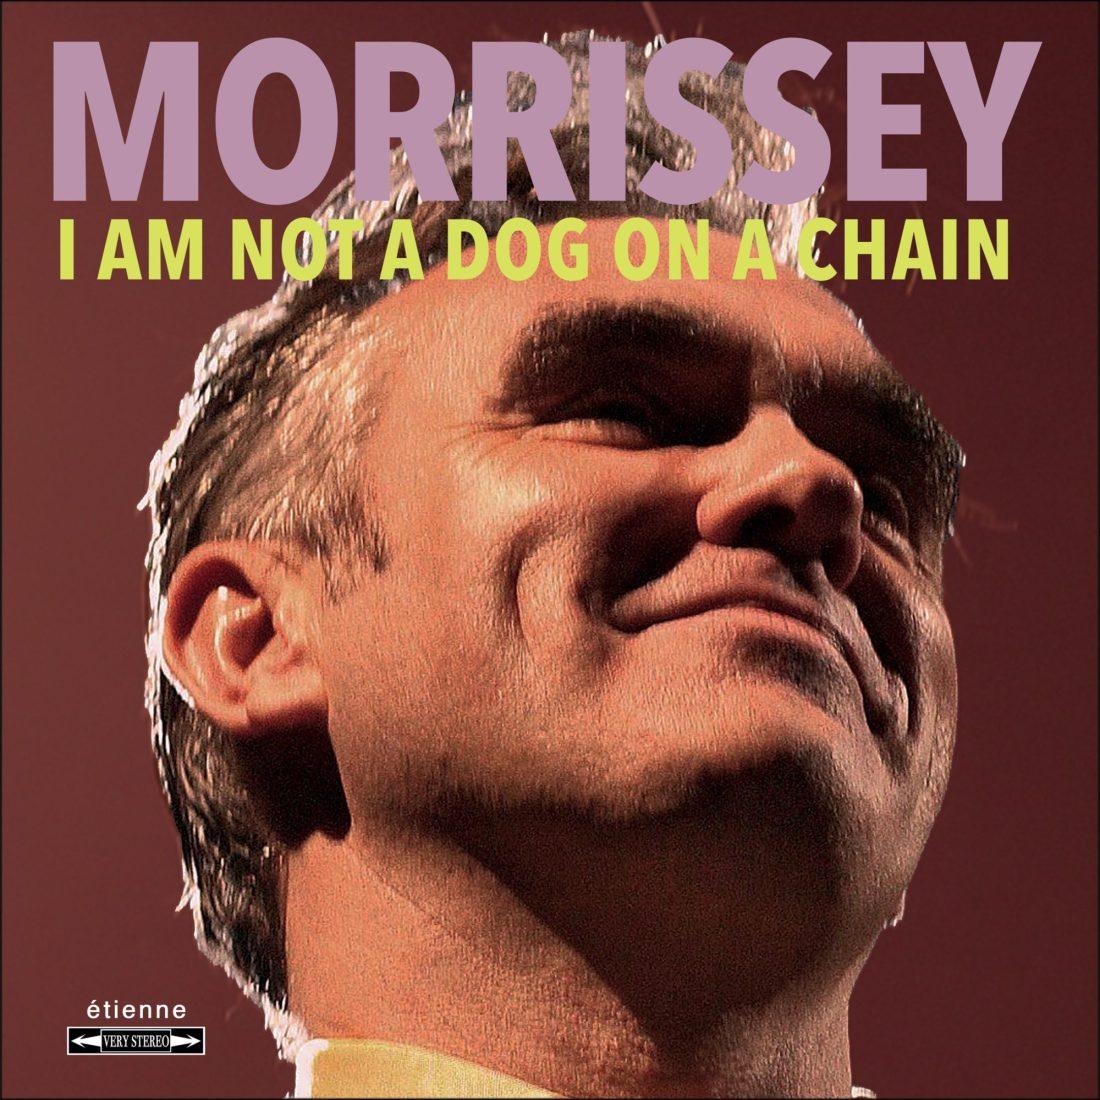 Morissey